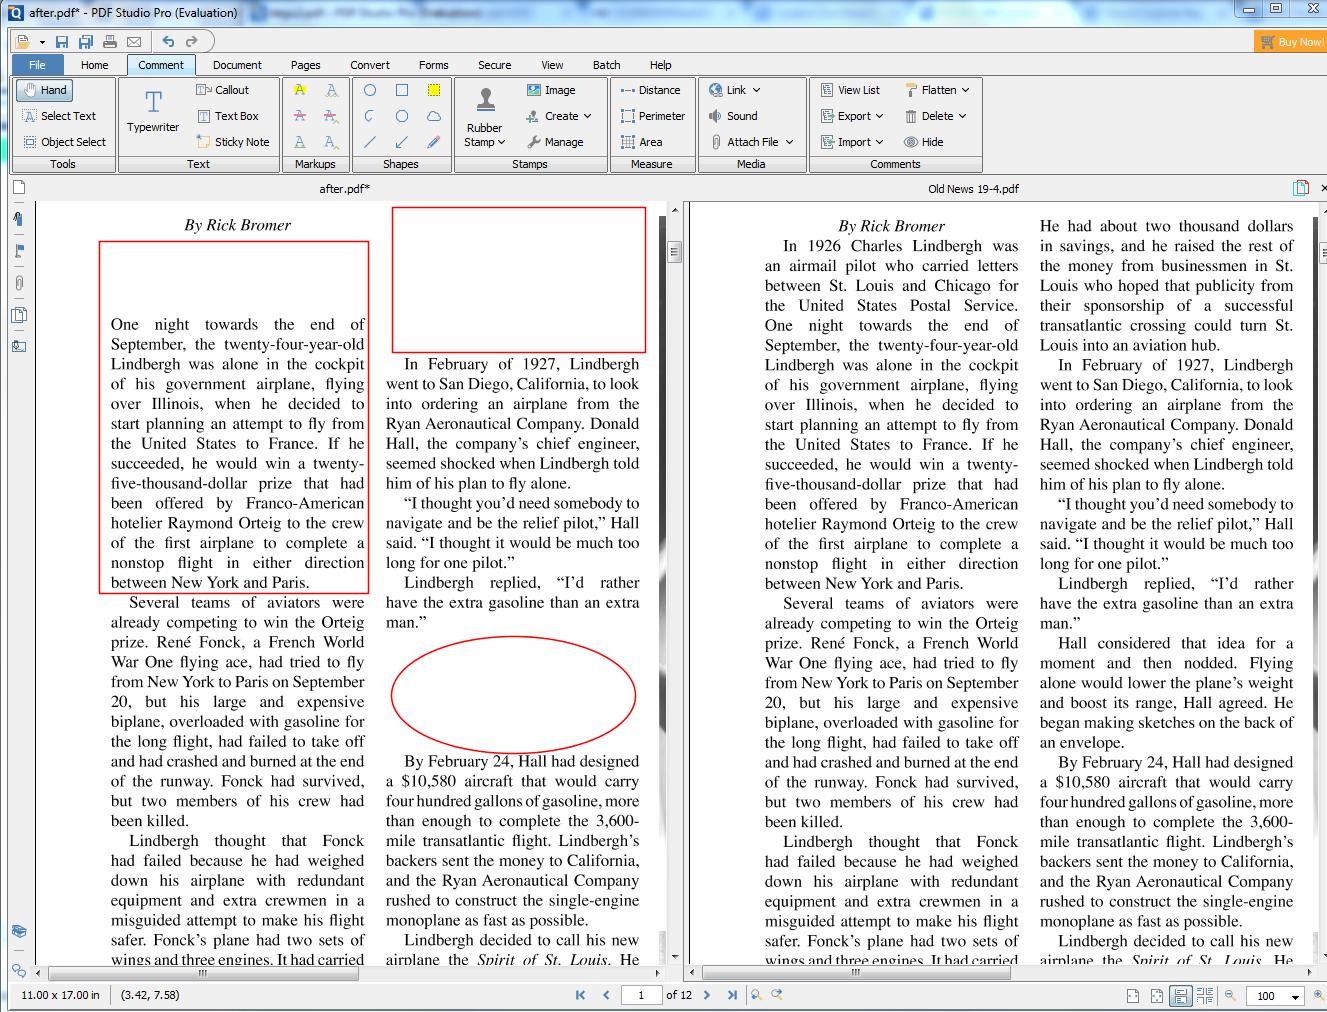 PDF Studio - side by side comparisons